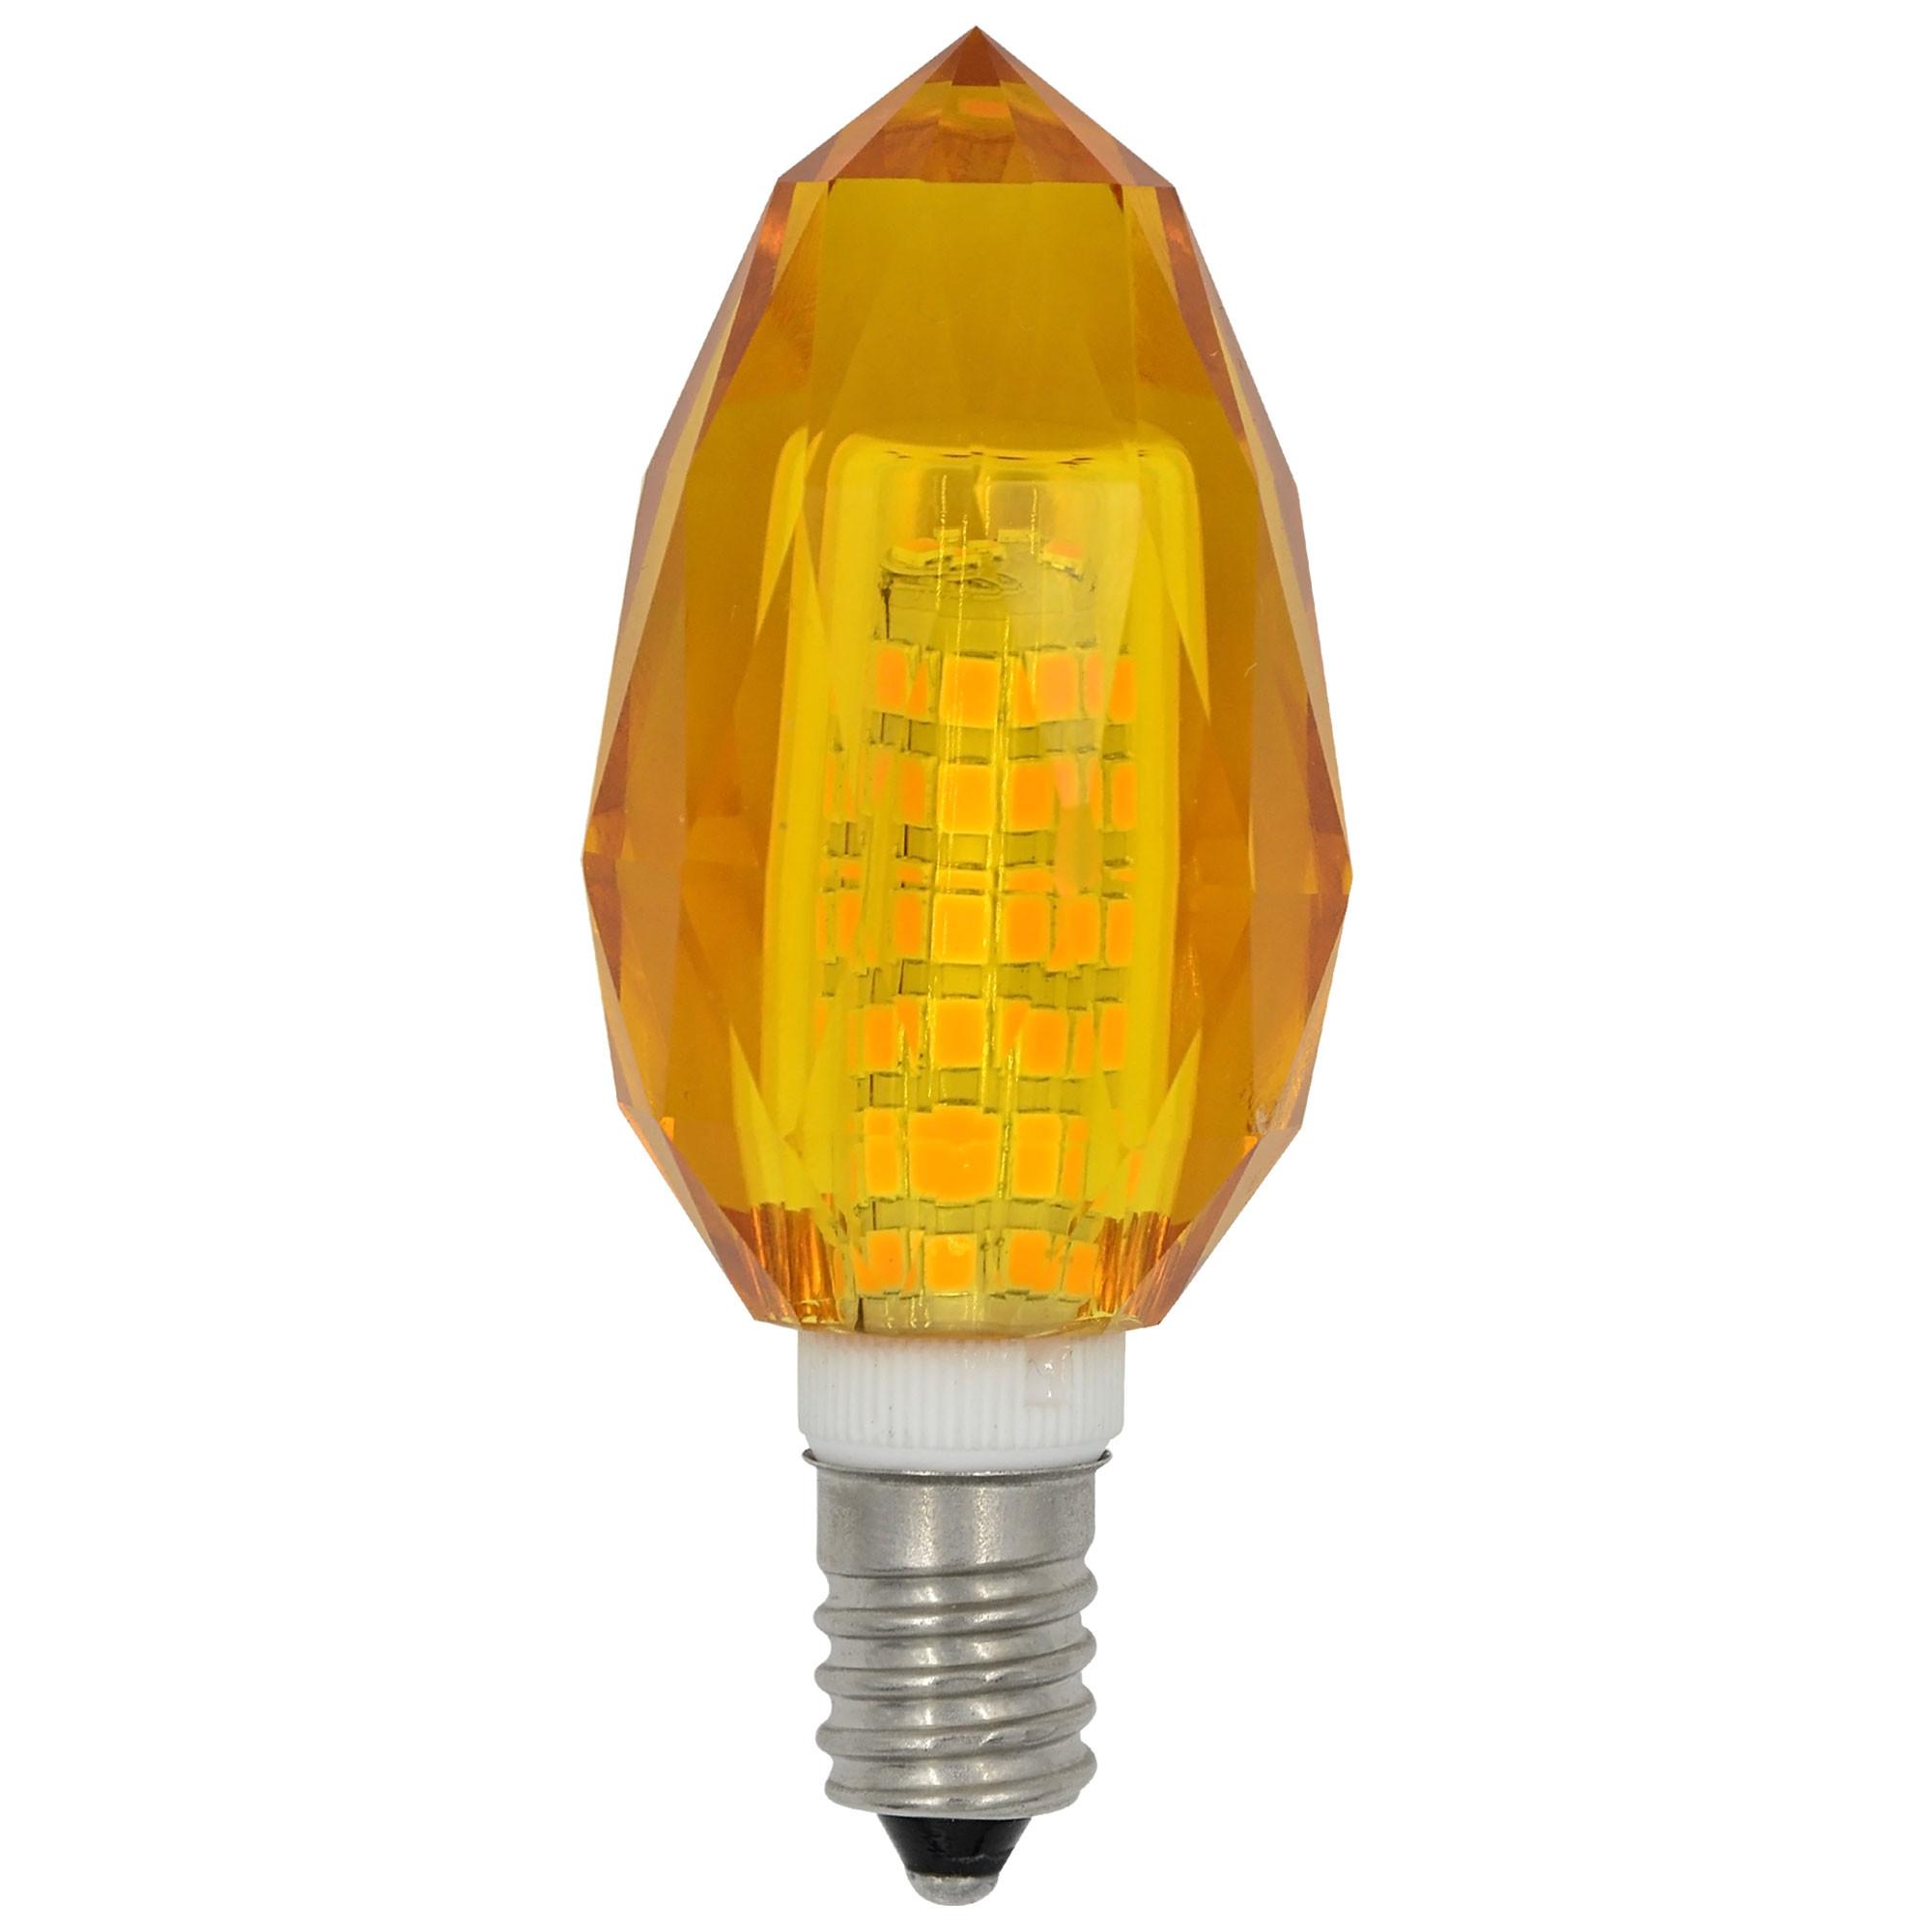 MENGS® E14 7W LED Light 75x 2835 SMD LED Bulb Lamp AC 220-240V Orange Energy-Saving Light